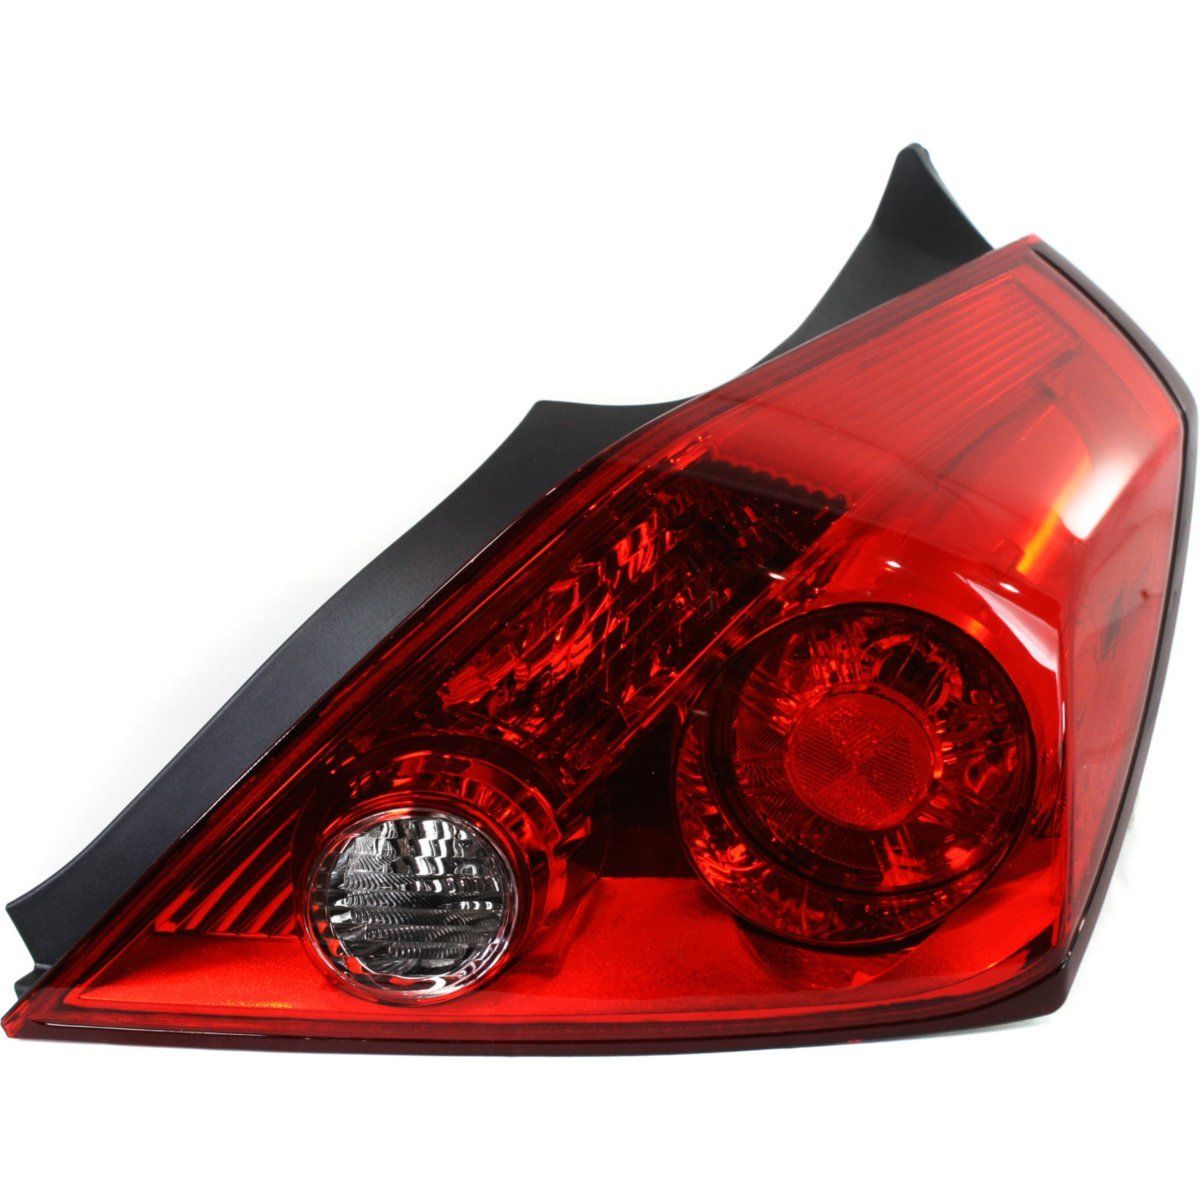 Genuine Nissan Parts 26550-JB100 Passenger Side Taillight Assembly